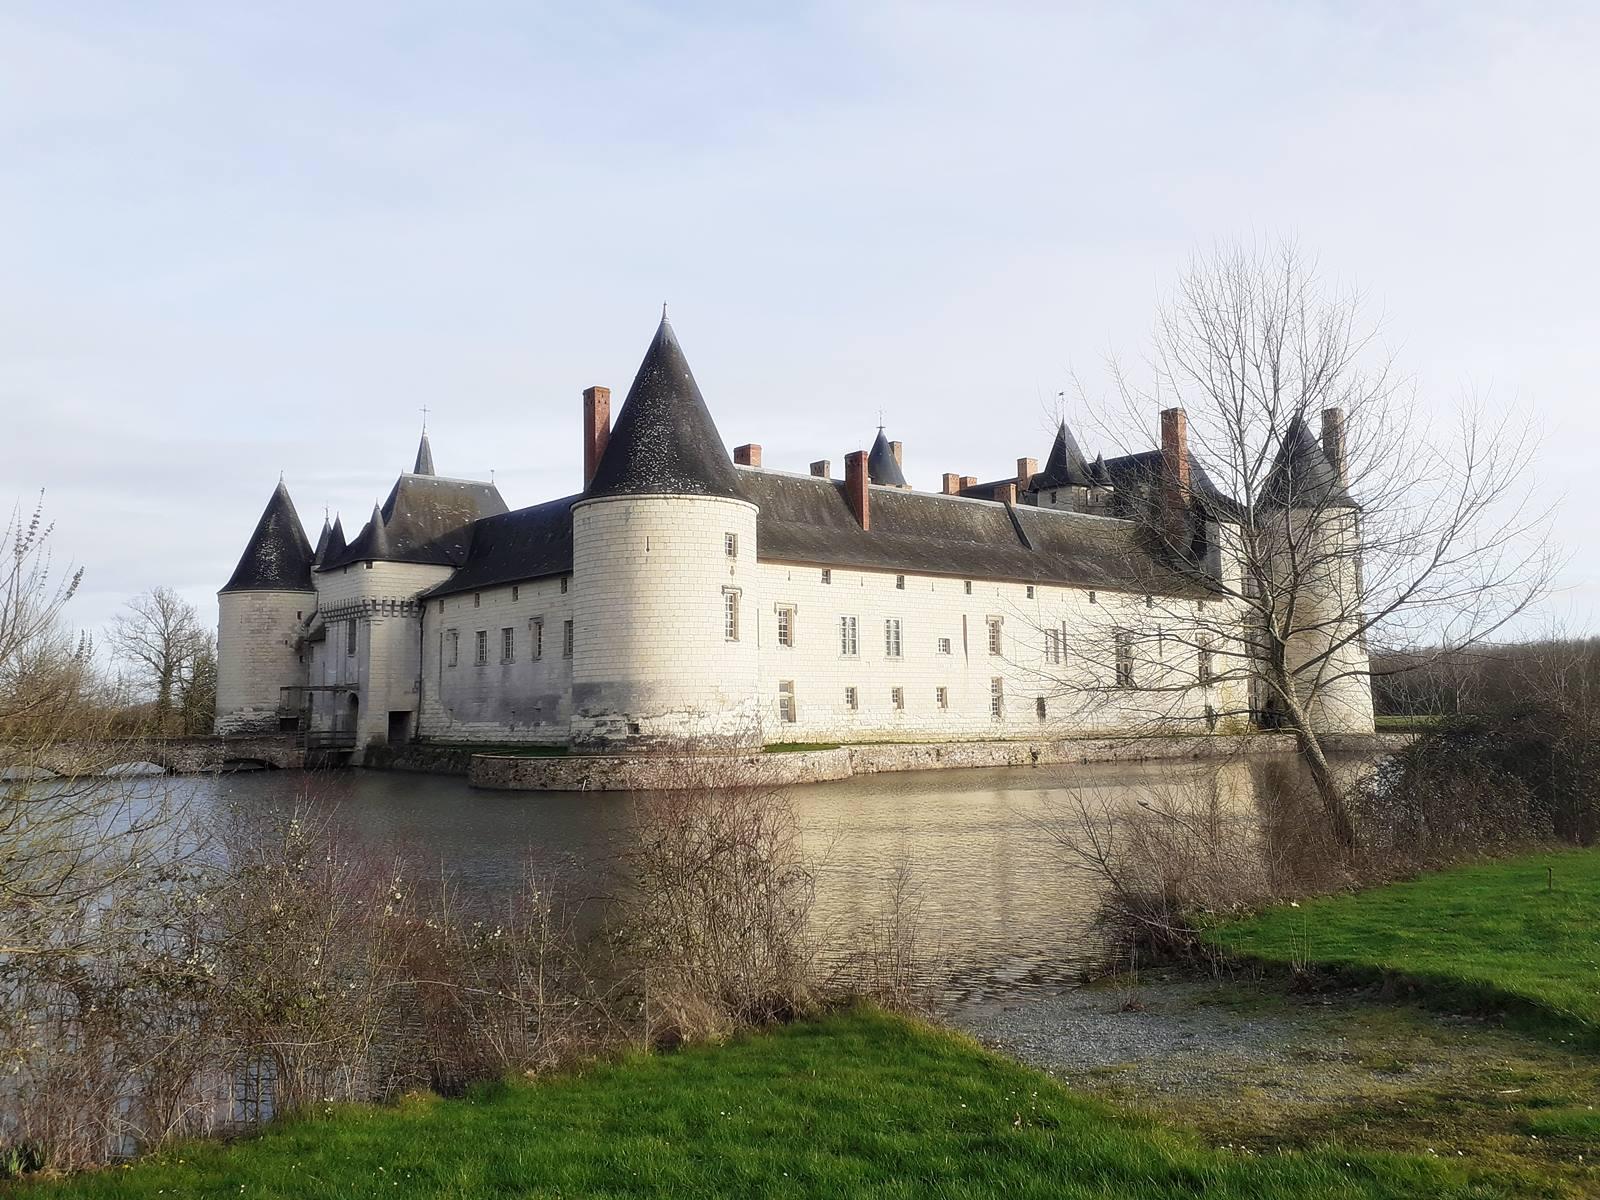 Chateau plessis bourre maine loire tourisme20200222 165455